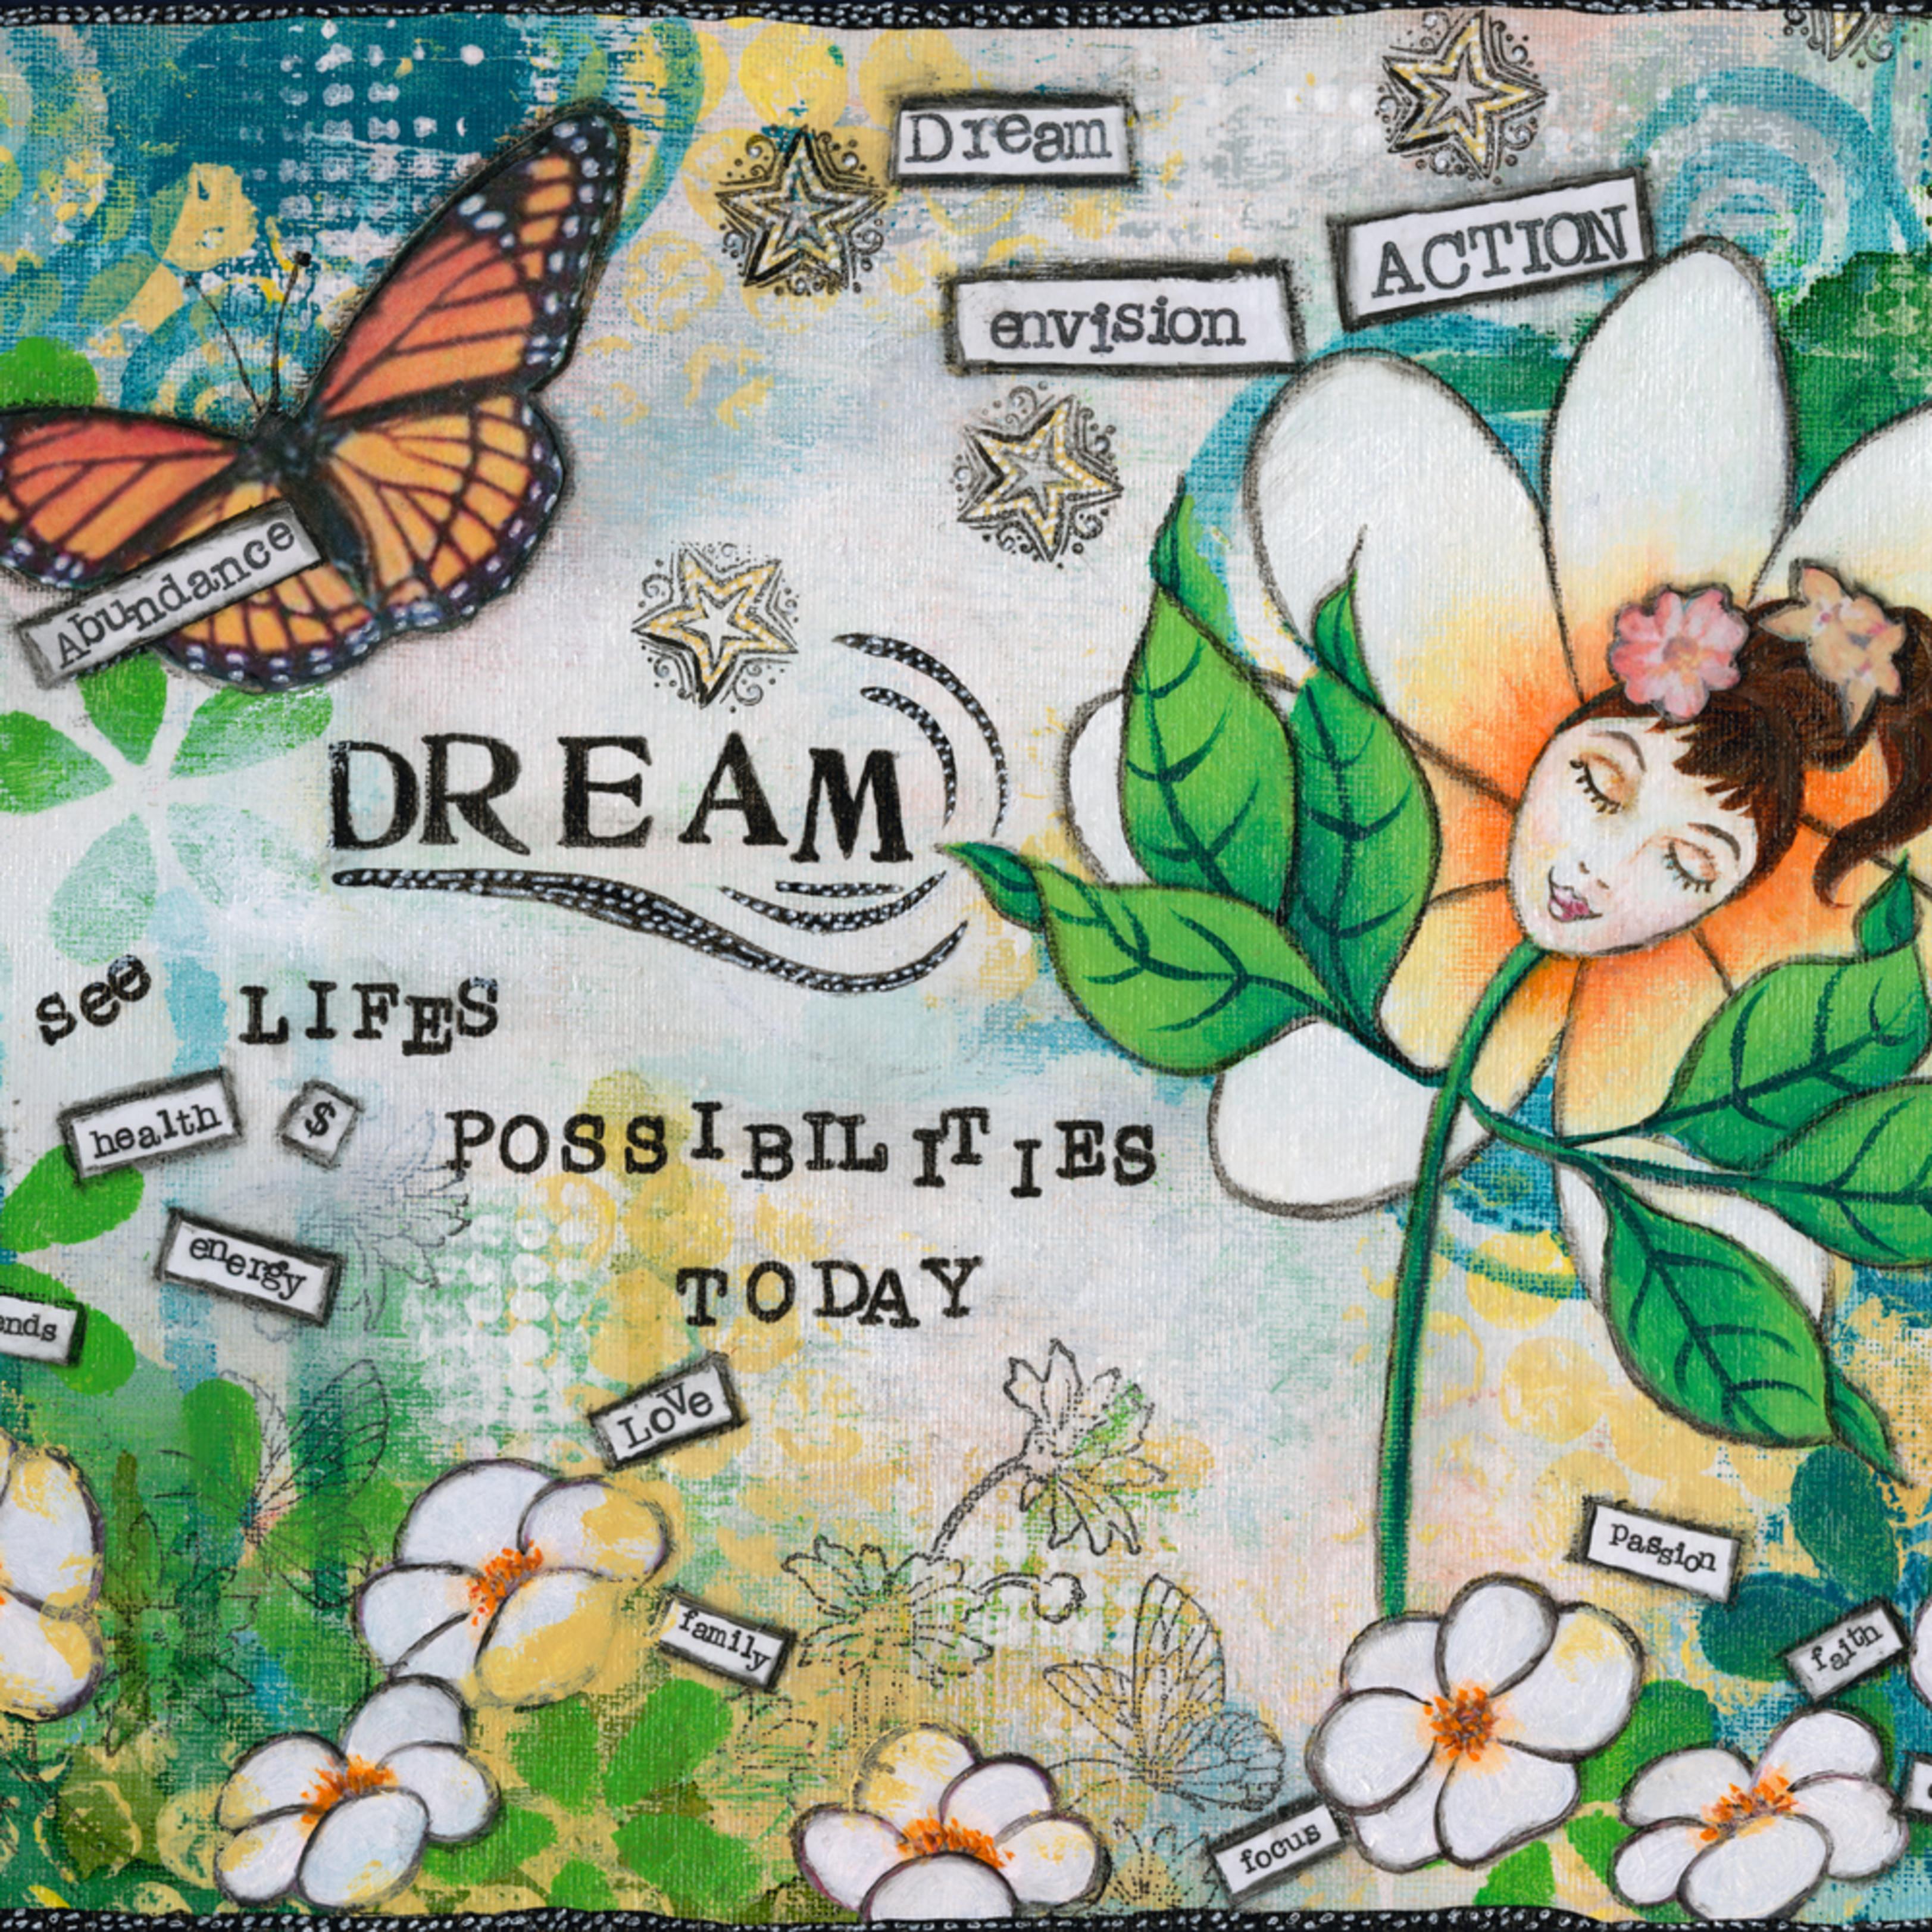 Dream hrpgnv